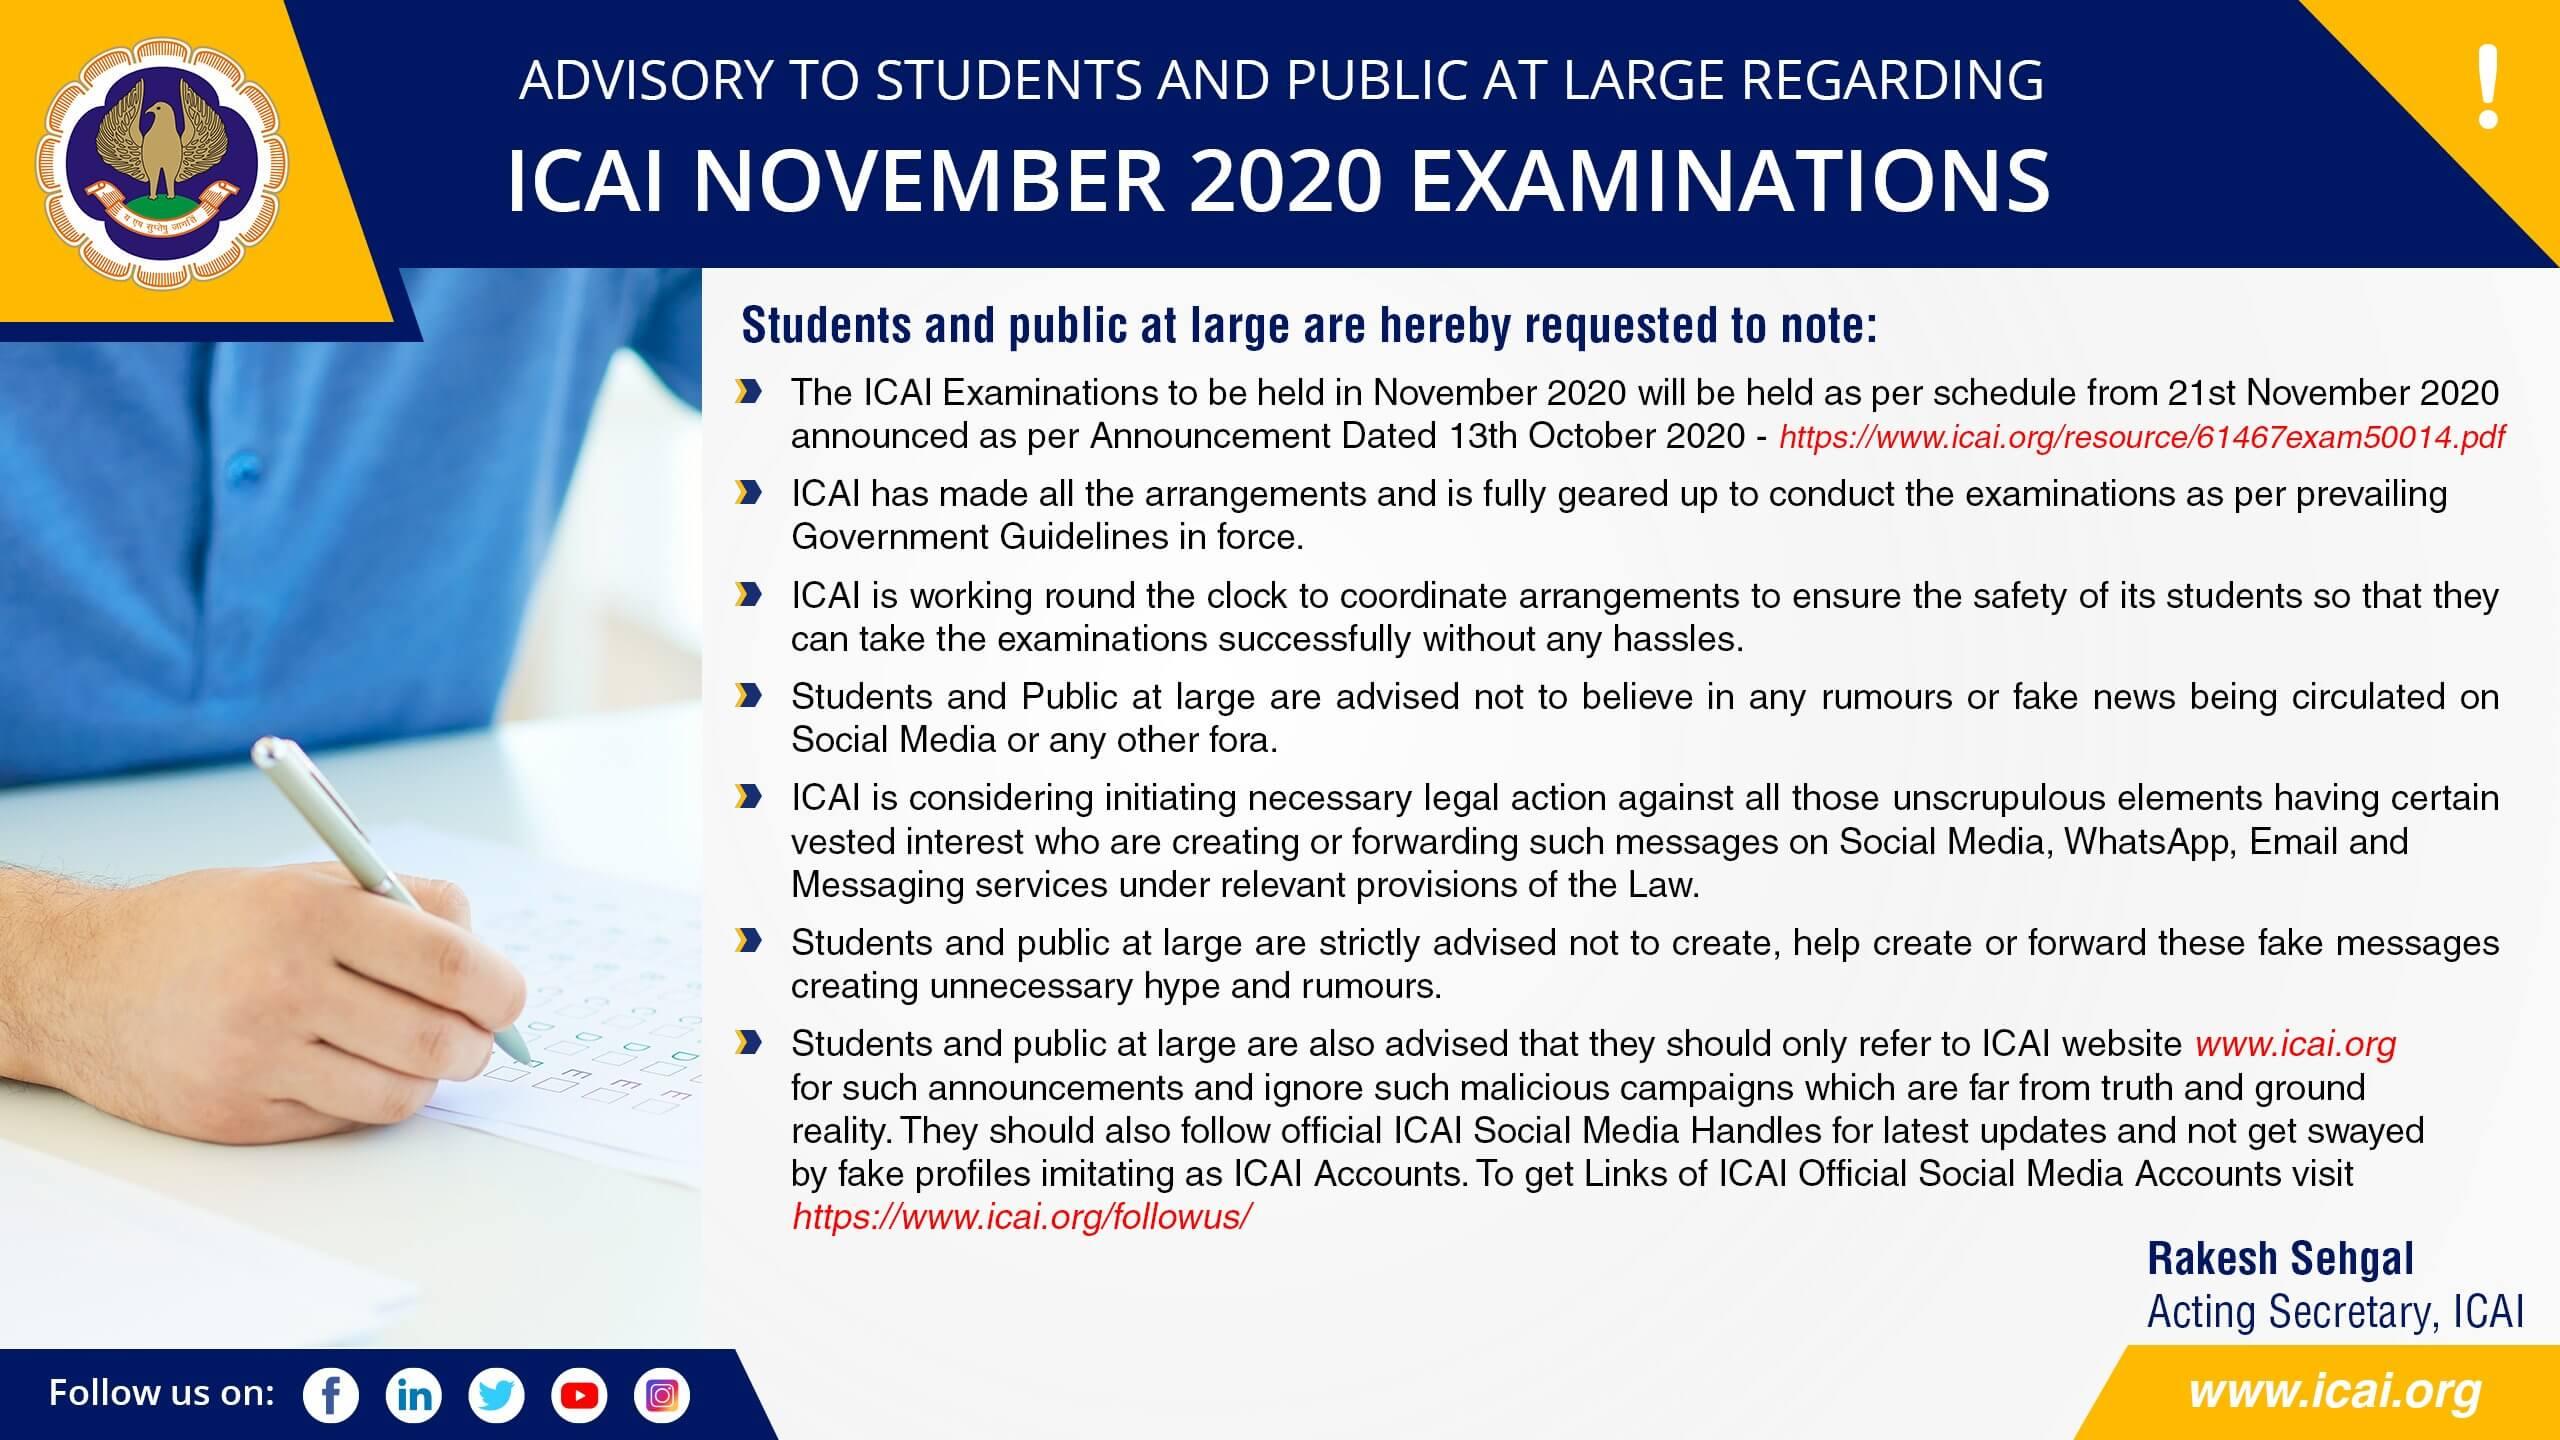 ICAI Advisory Nov 20 Exams